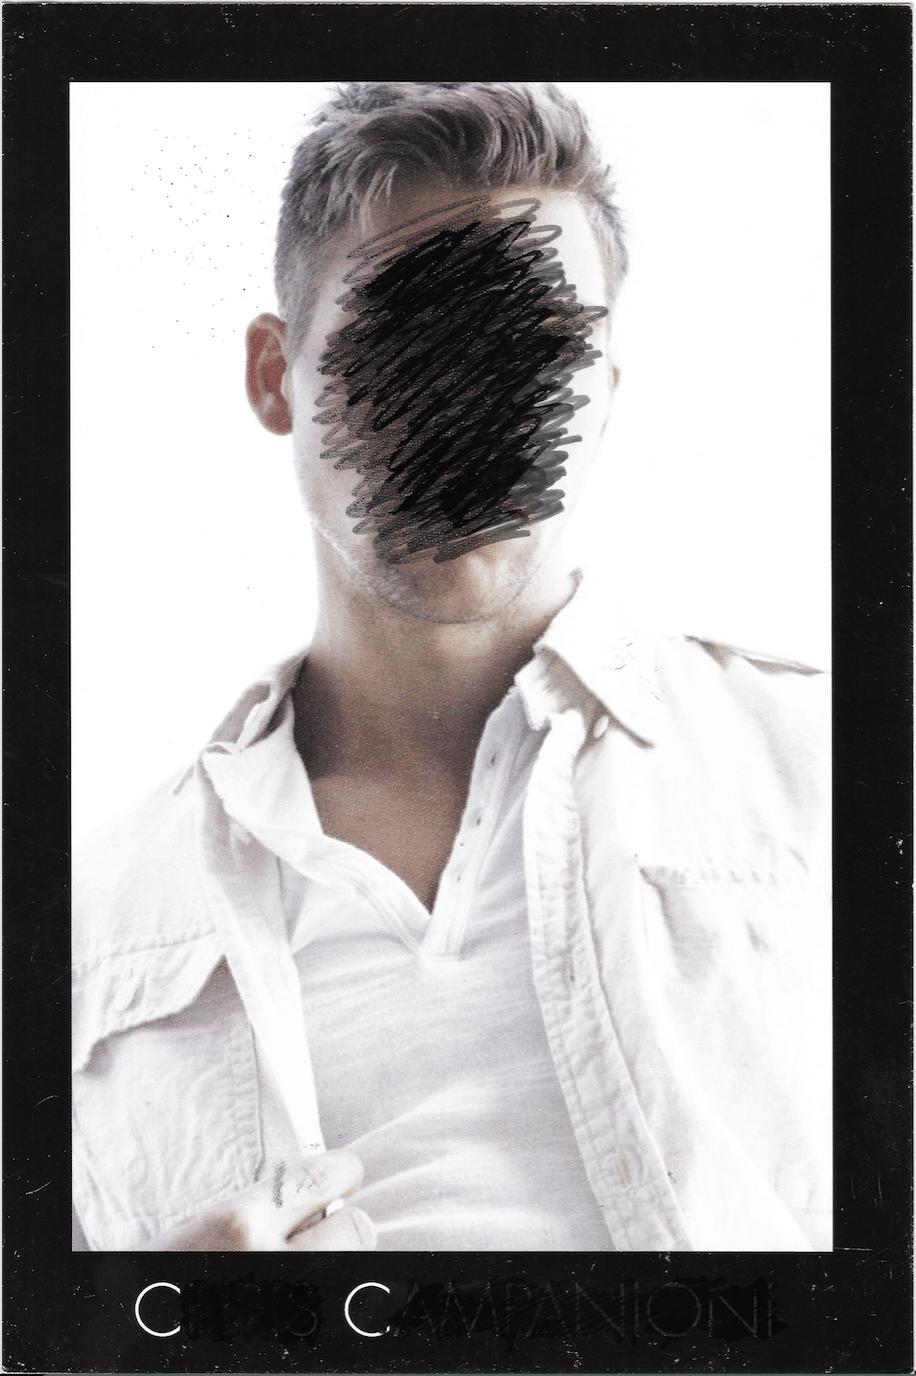 My Self erasure, Front, layout